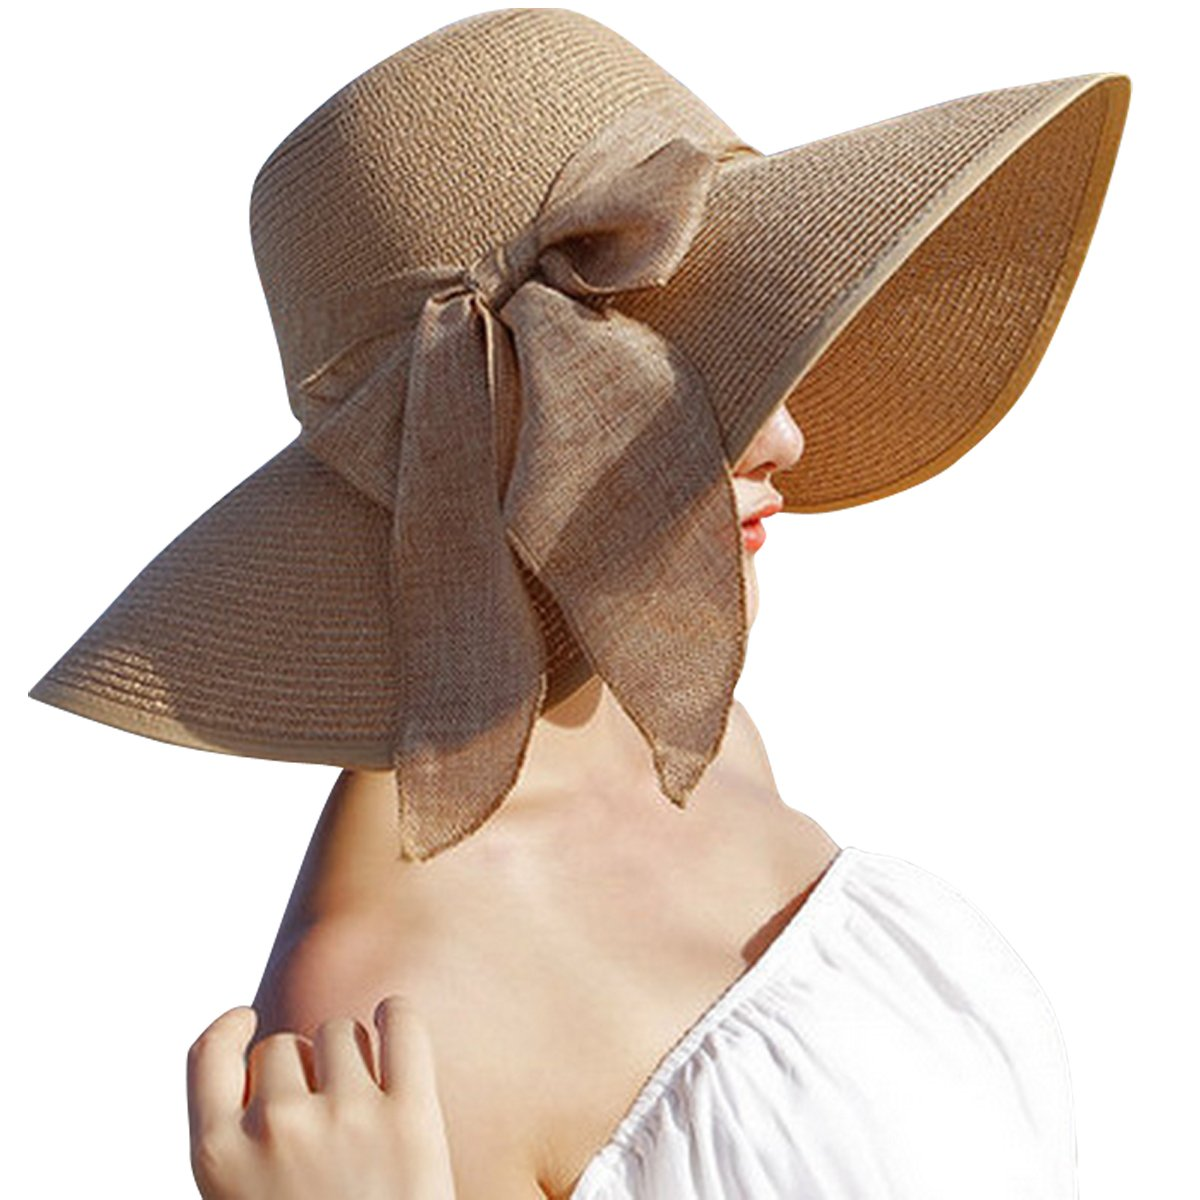 JOYEBUY Women Lady Big Bowknot Straw Hat Floppy Foldable Roll up UV Protection Beach Cap Sun Hat (Khaki)